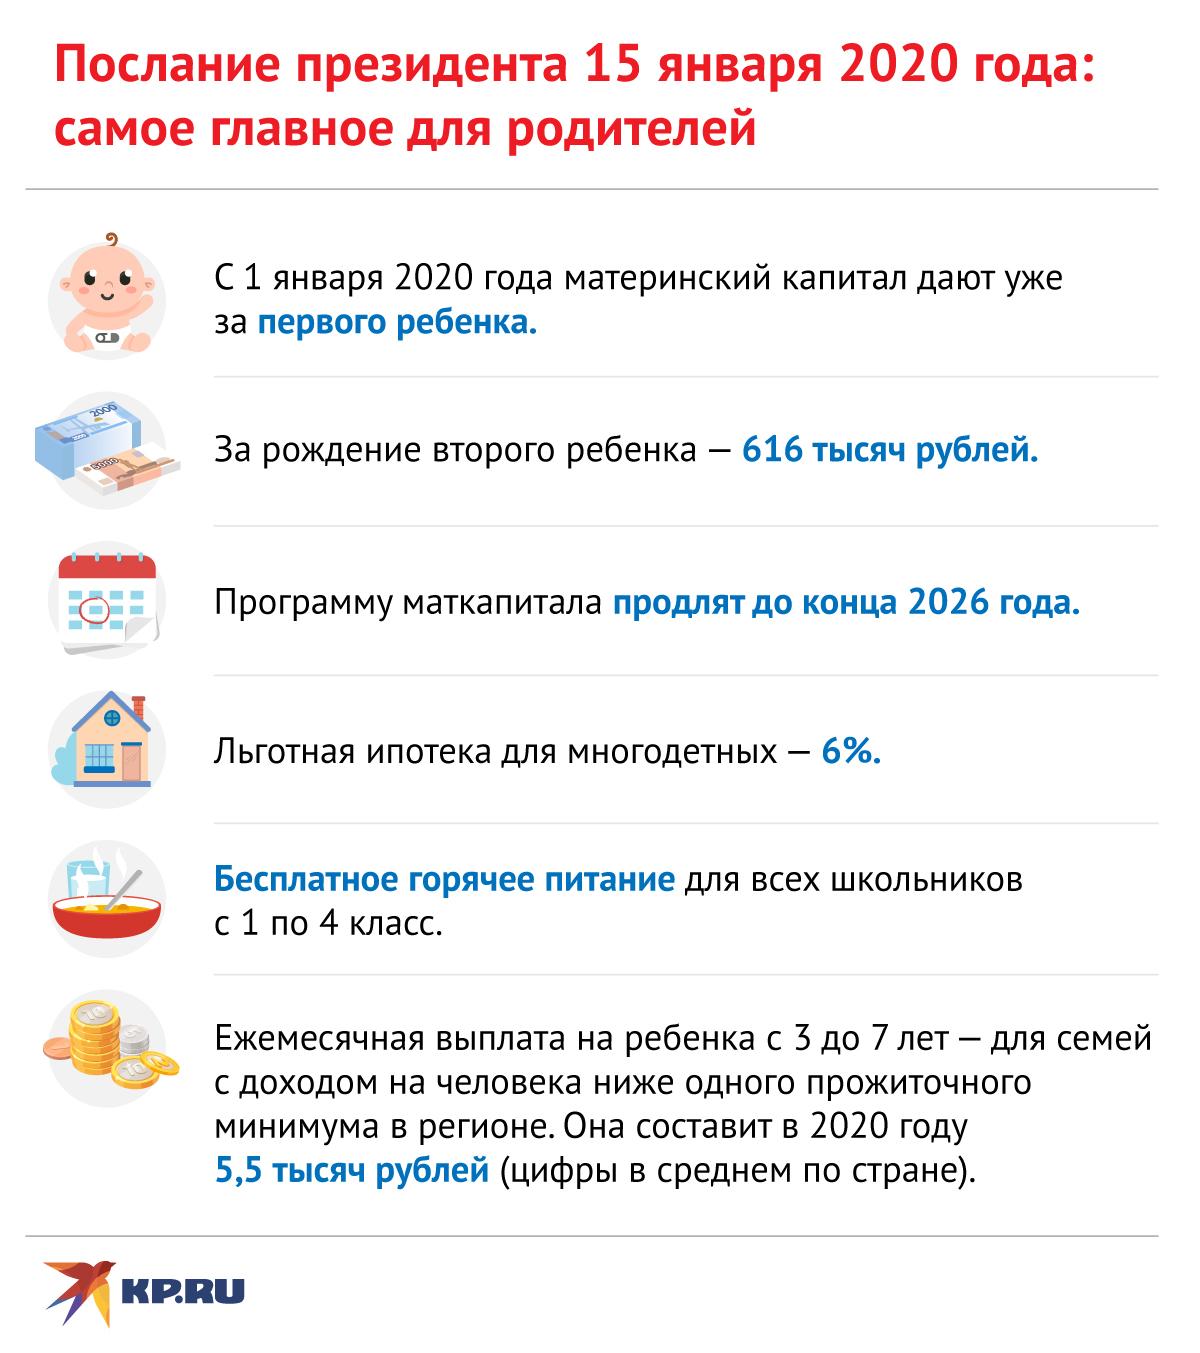 kakoj-budet-materinskij-kapital-v-2020-godu-2